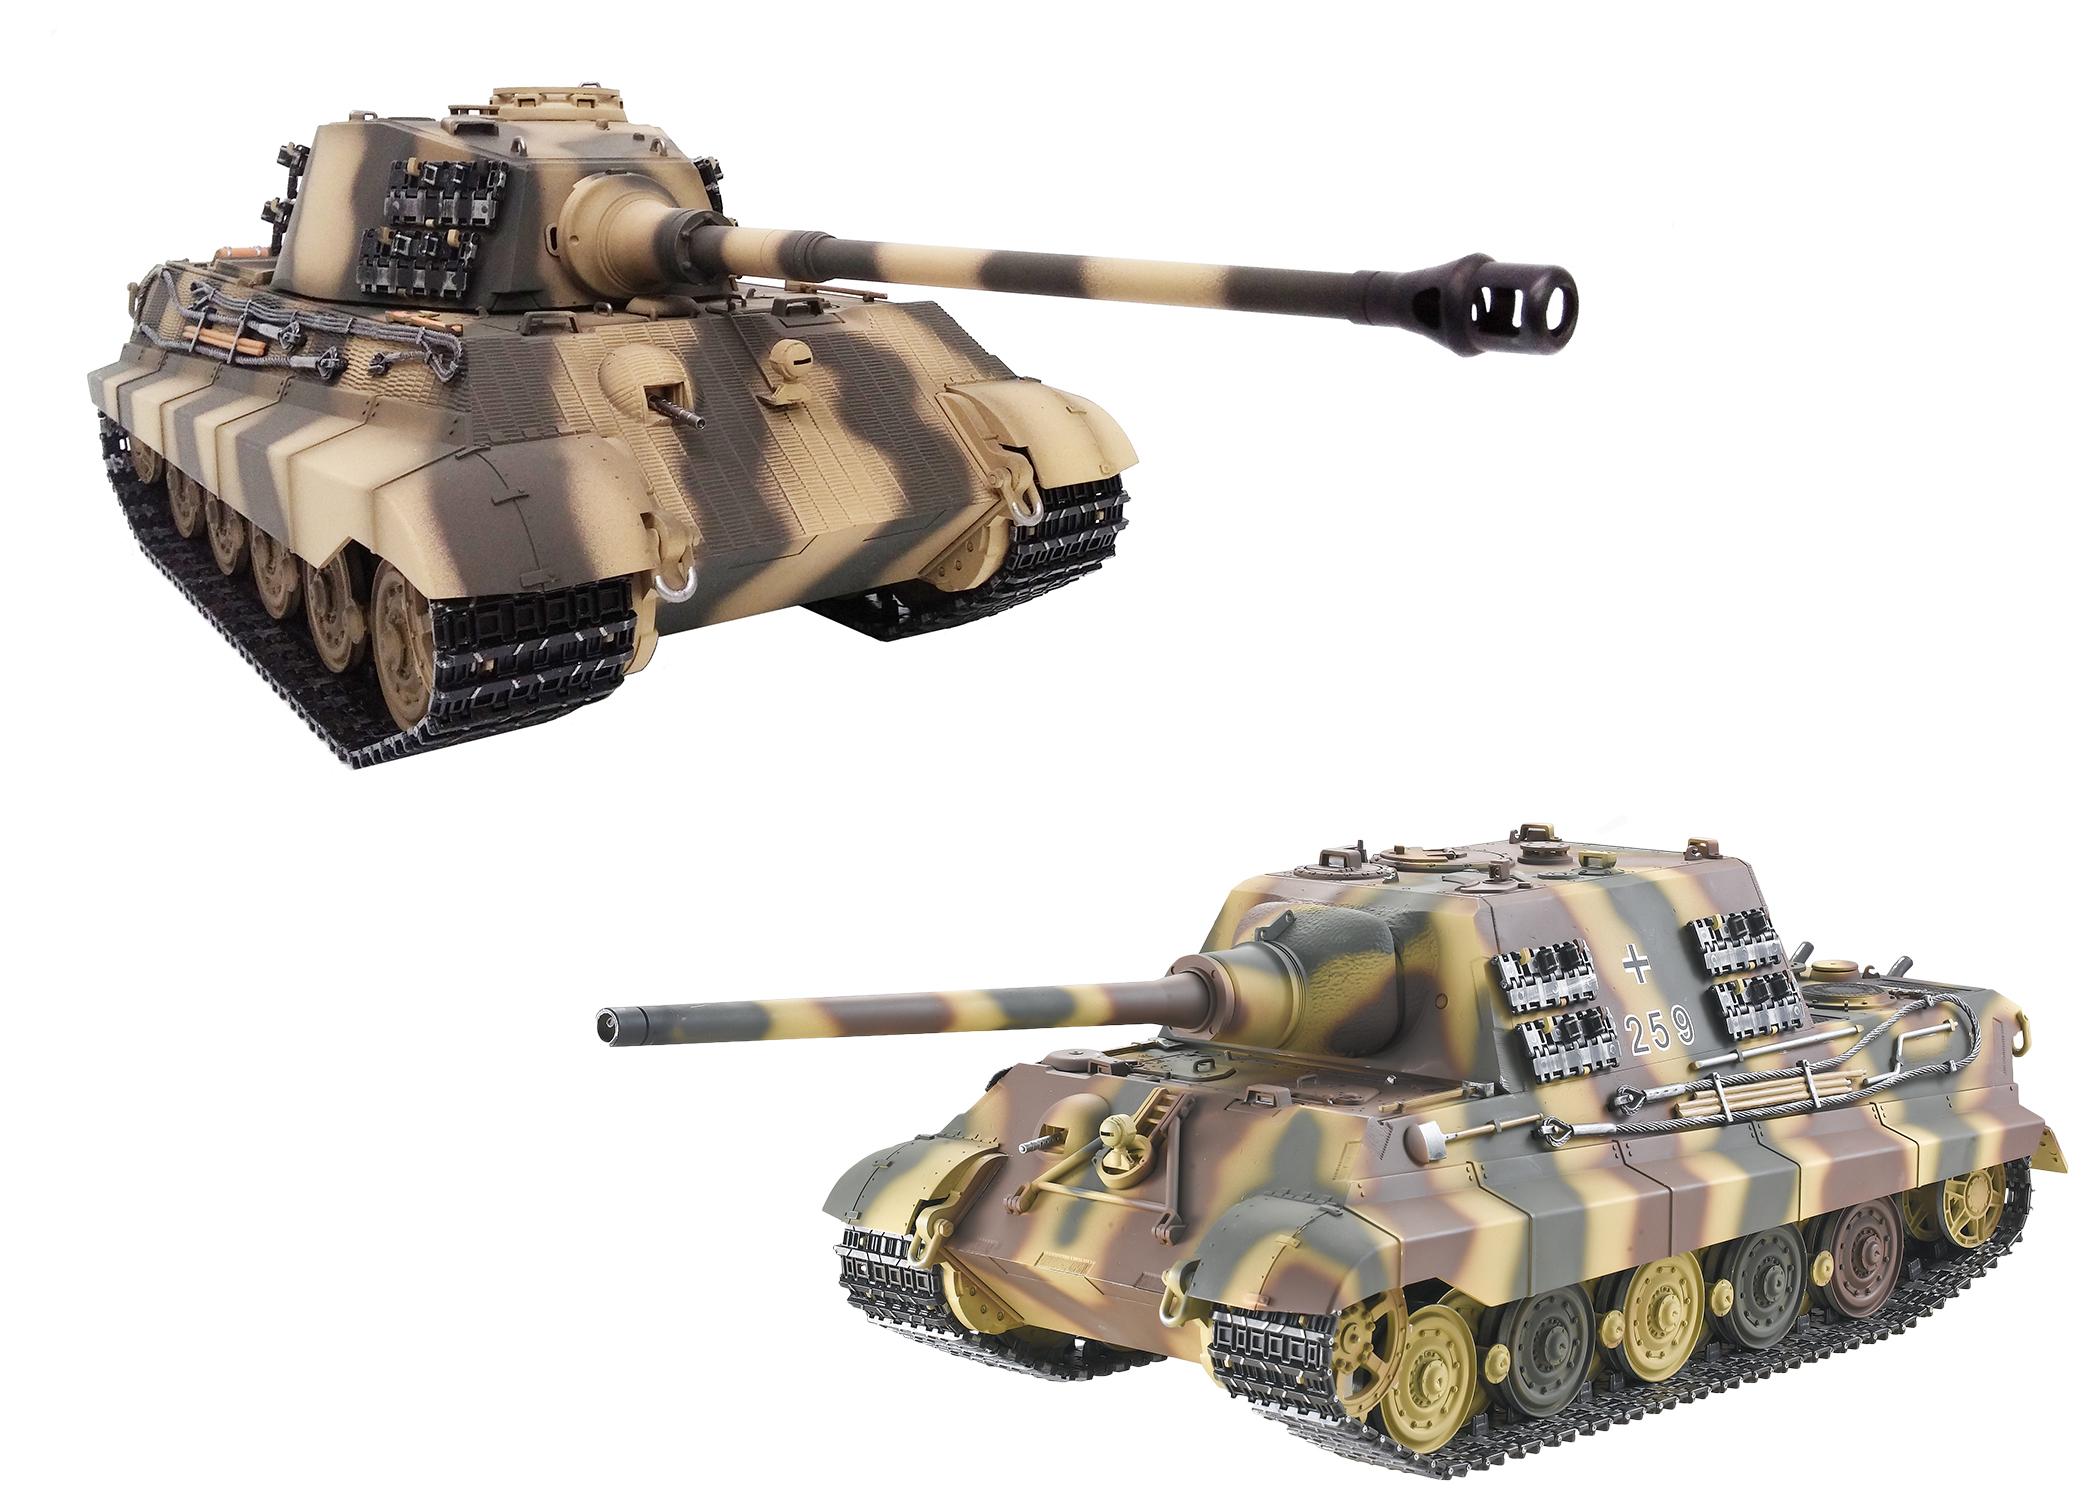 King Tiger & Jagdtiger Tank Parts